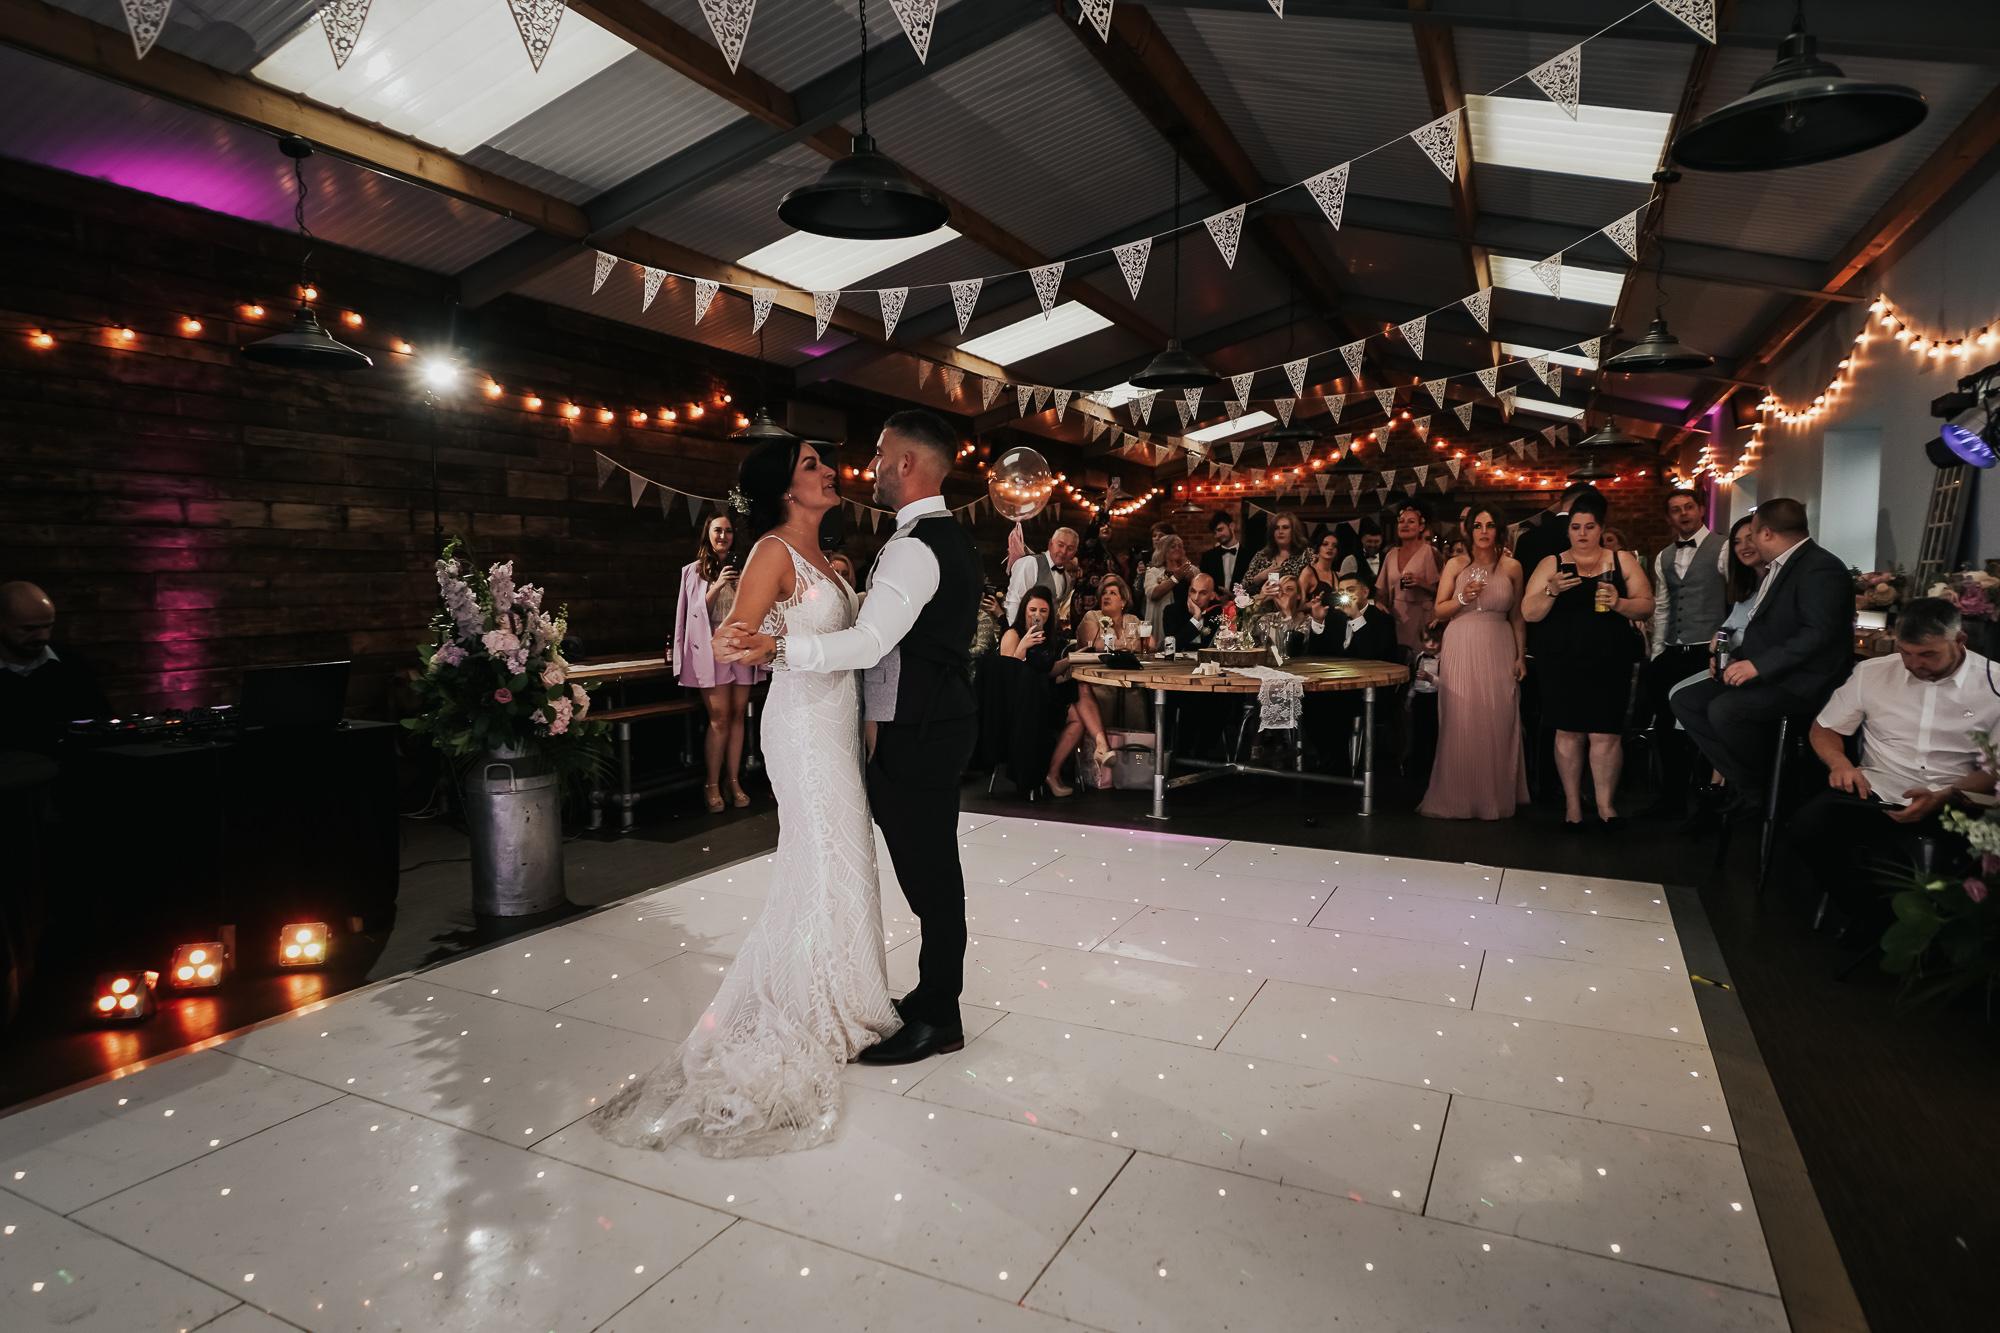 The Hayloft Wedding Photography Cheshire wedding photographer (50 of 52).jpg